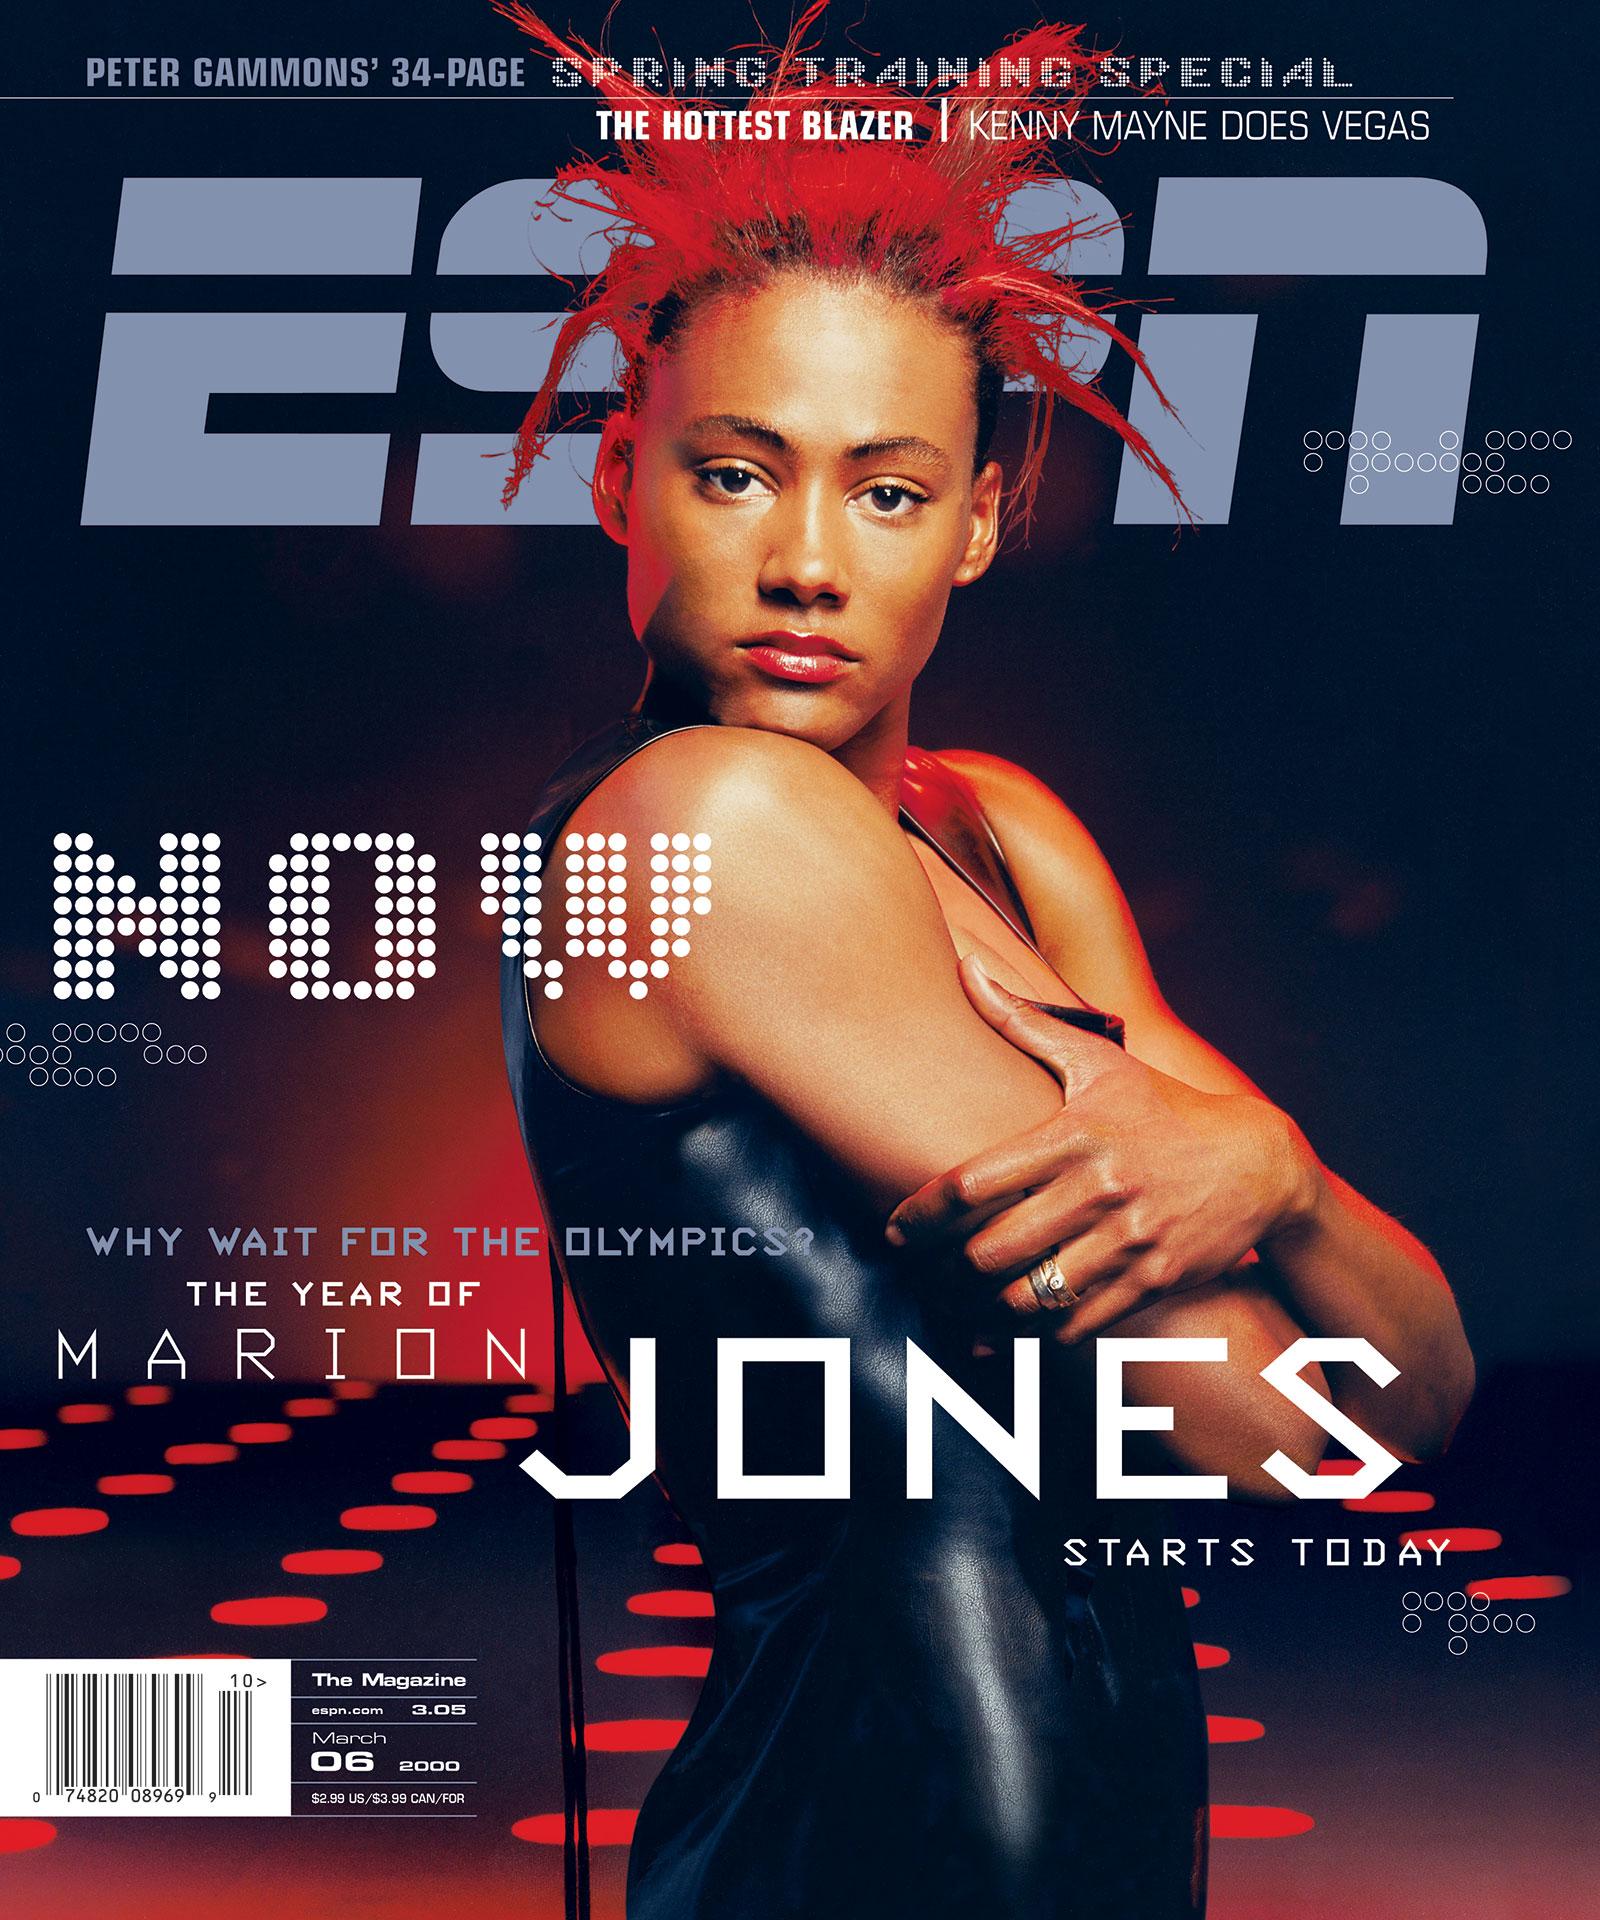 Espn The Magazine 2000 Covers Espn